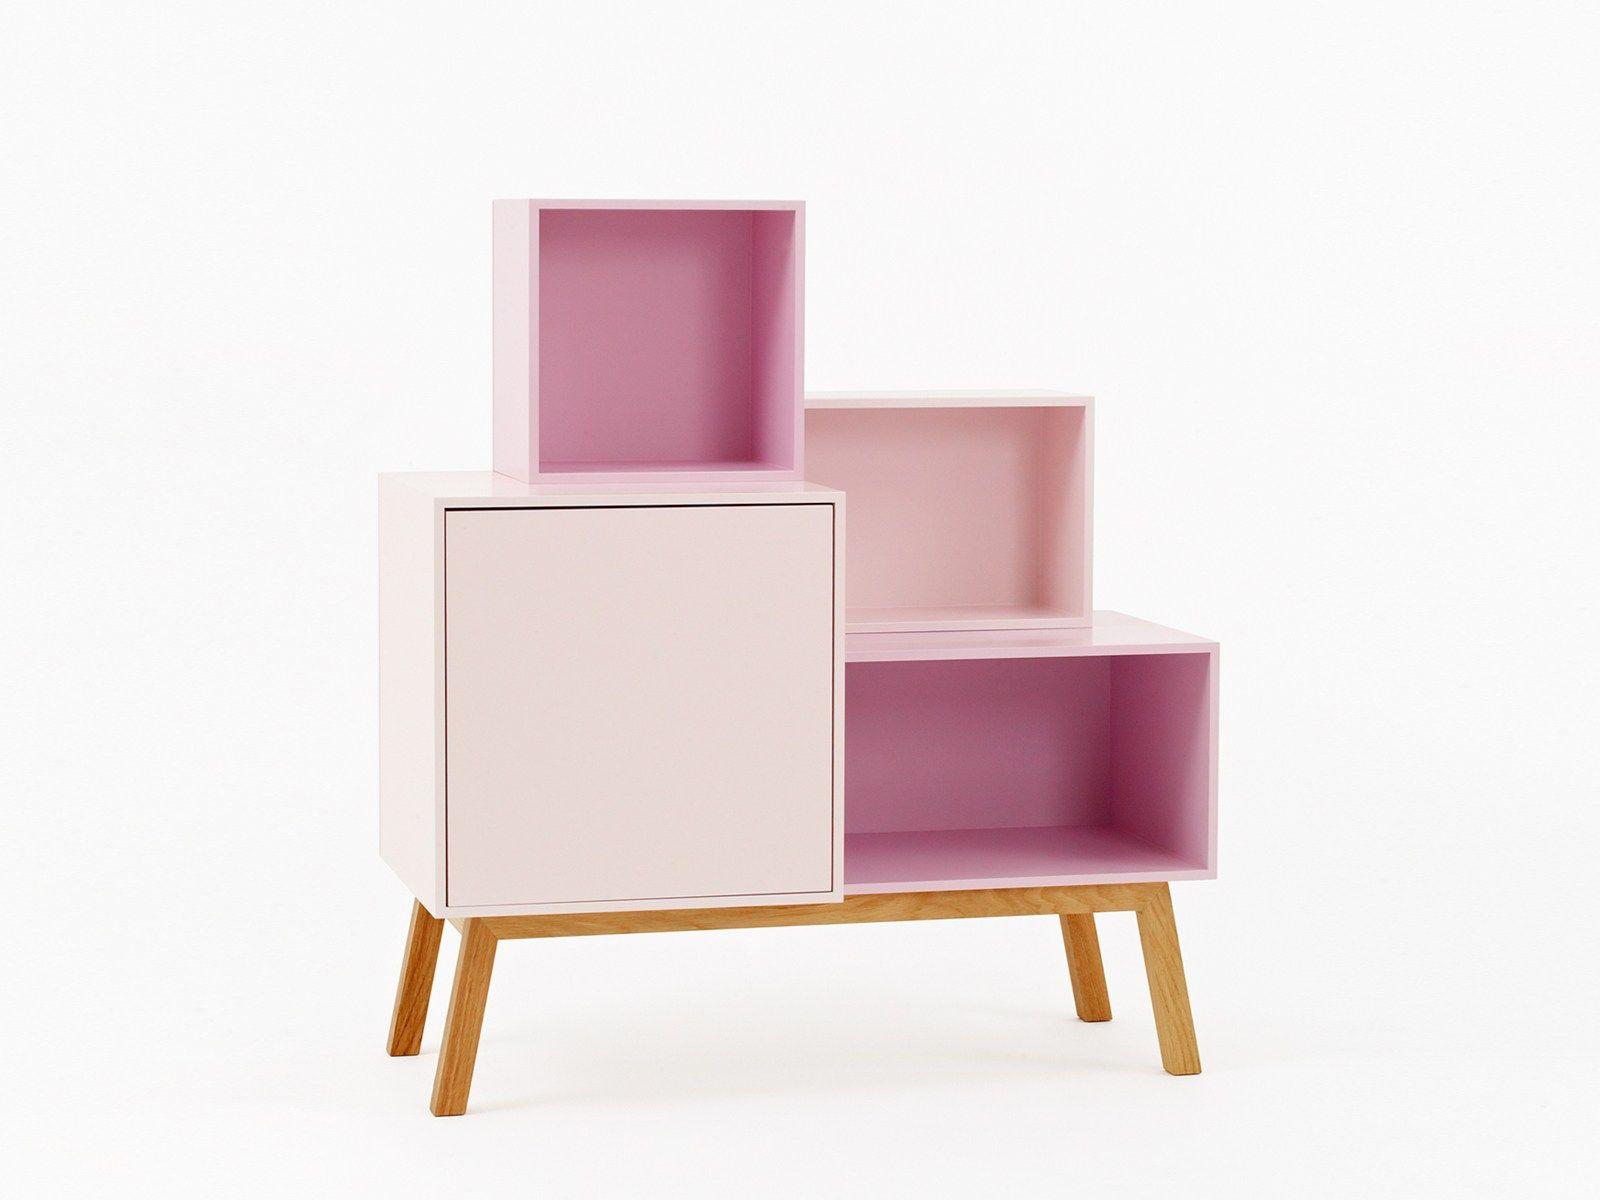 modular furniture system. Modular Furniture System C